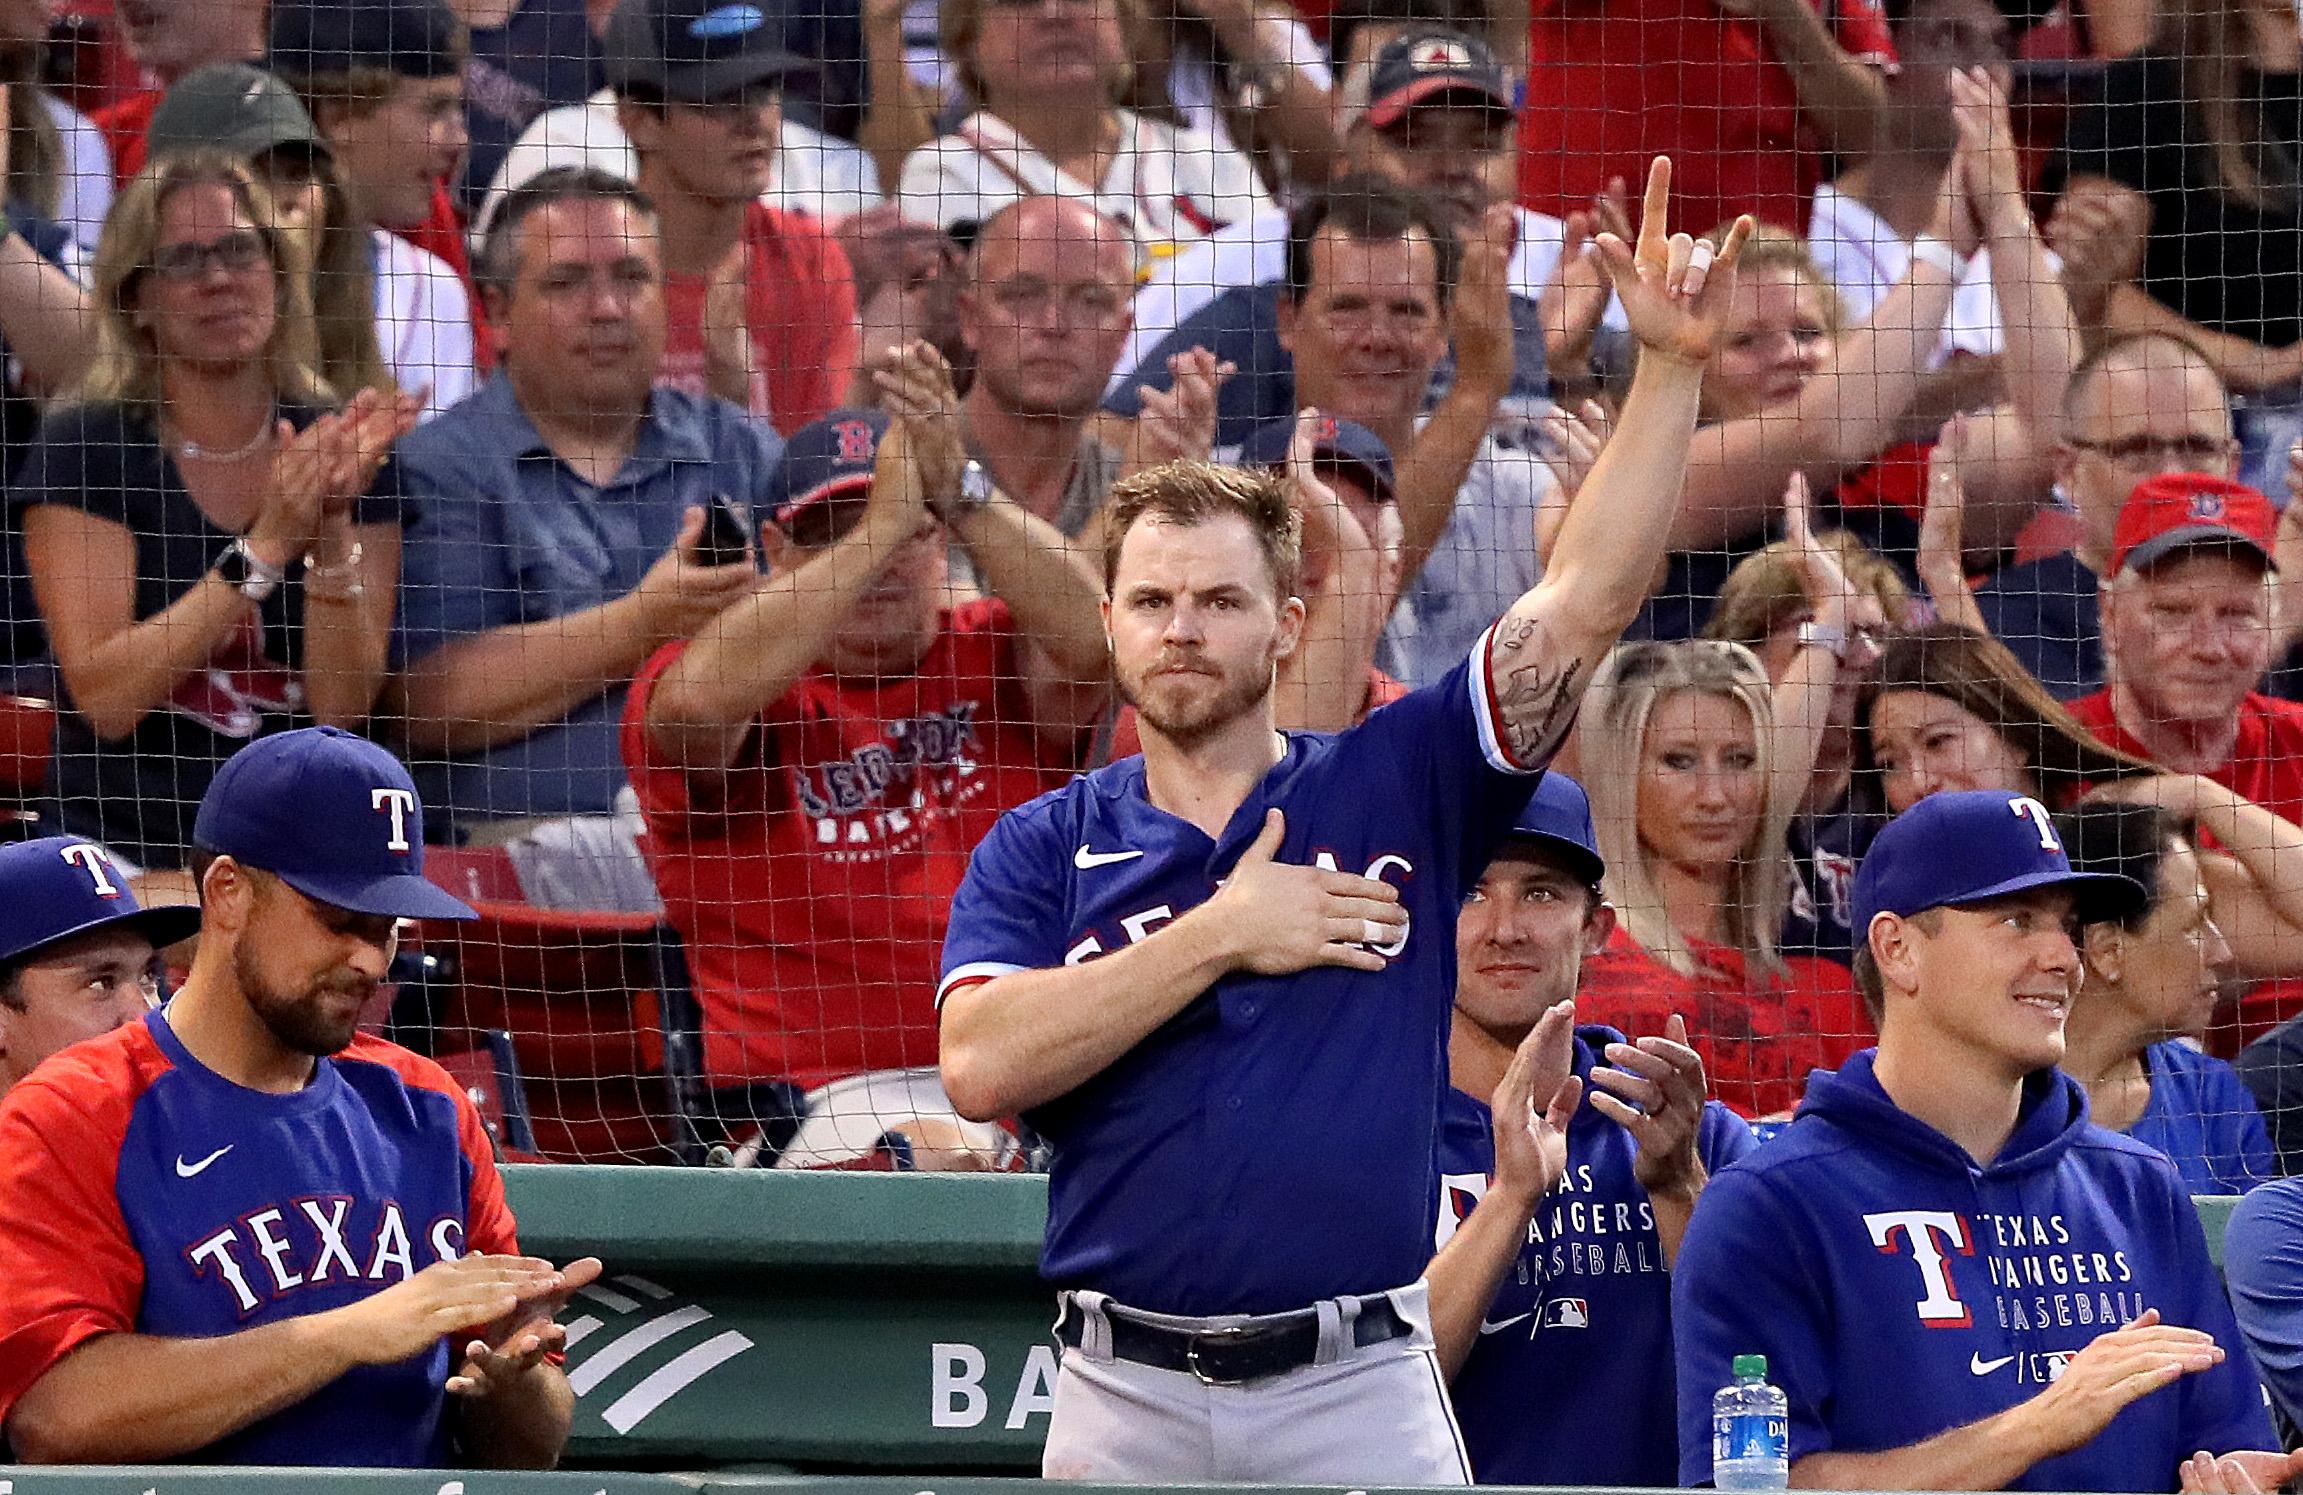 Texas Rangers Vs. Boston Red Sox at Fenway Park